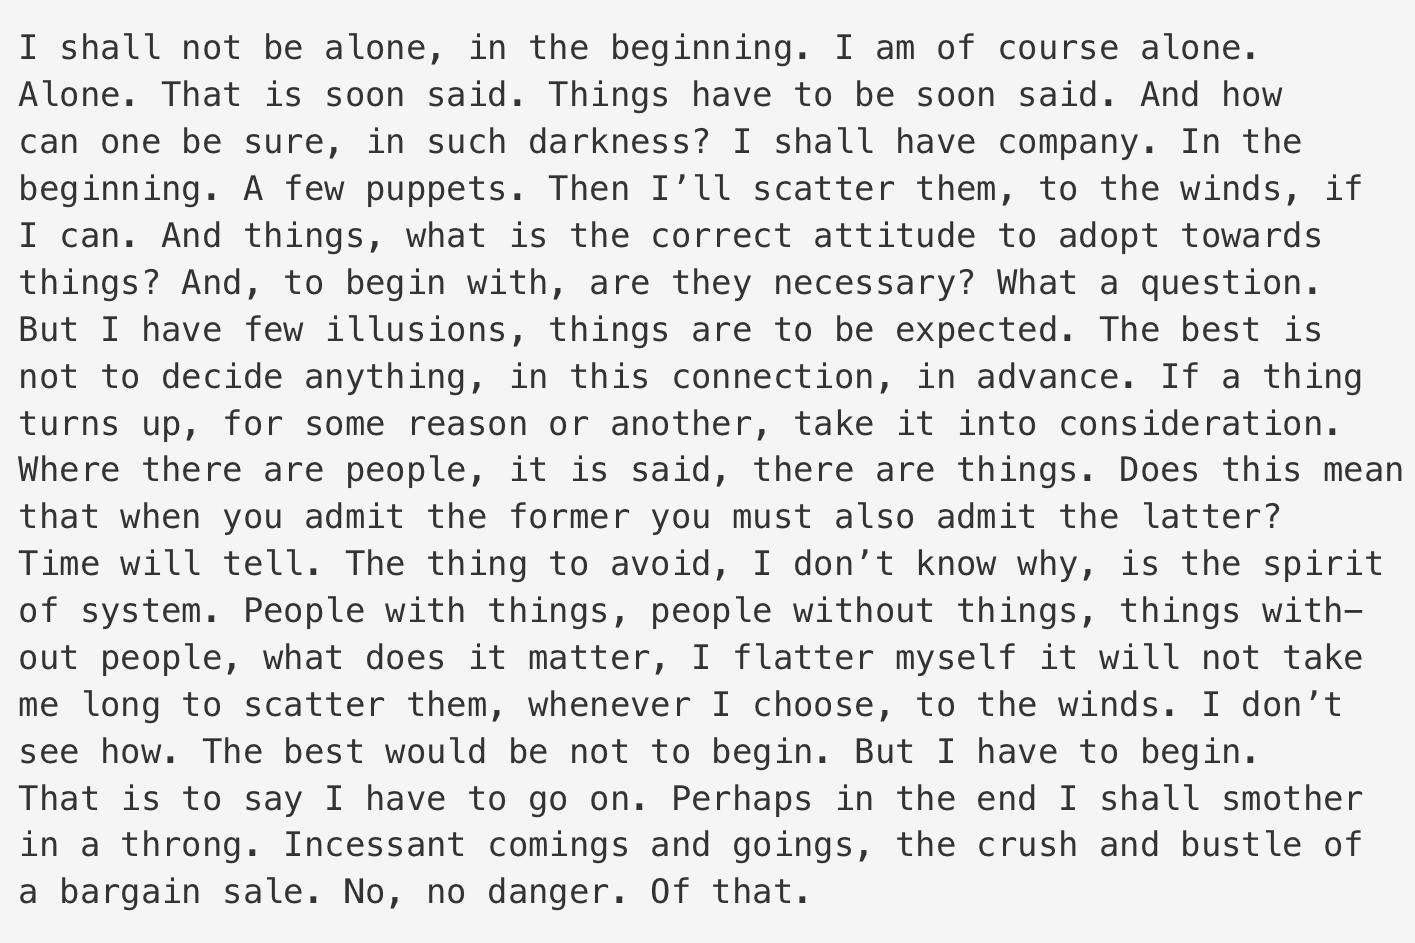 Samuel Beckett's The Unnamable